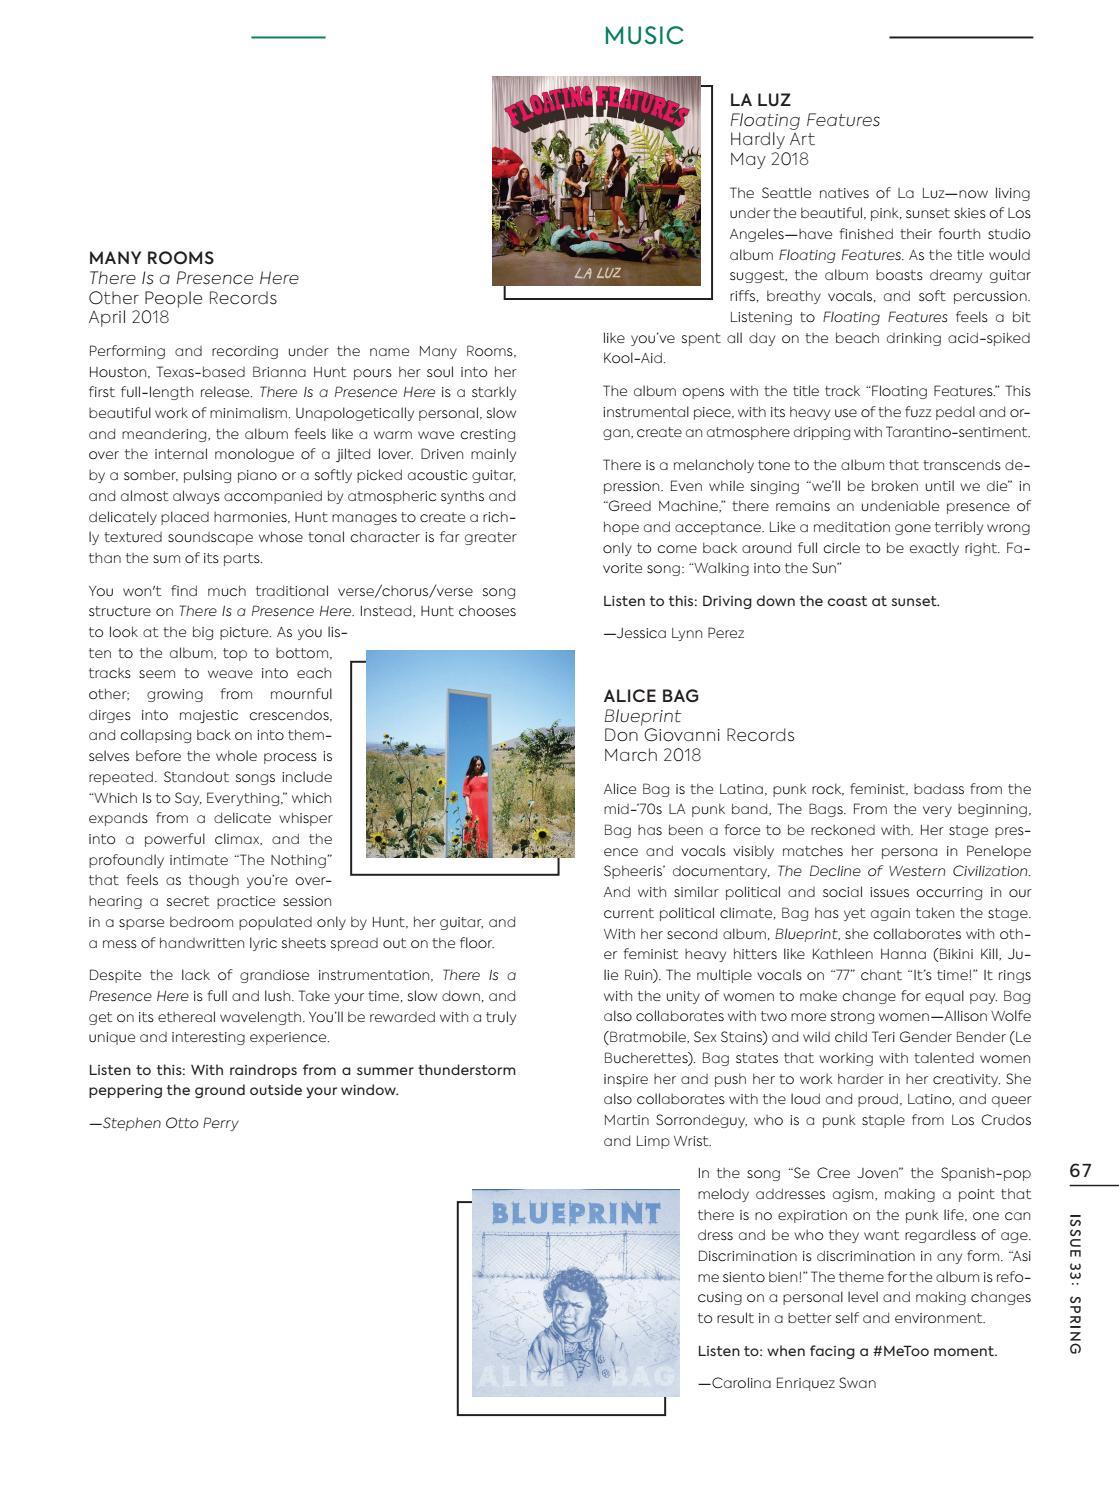 Tom tom magazine issue 33 by tom tom magazine issuu malvernweather Choice Image